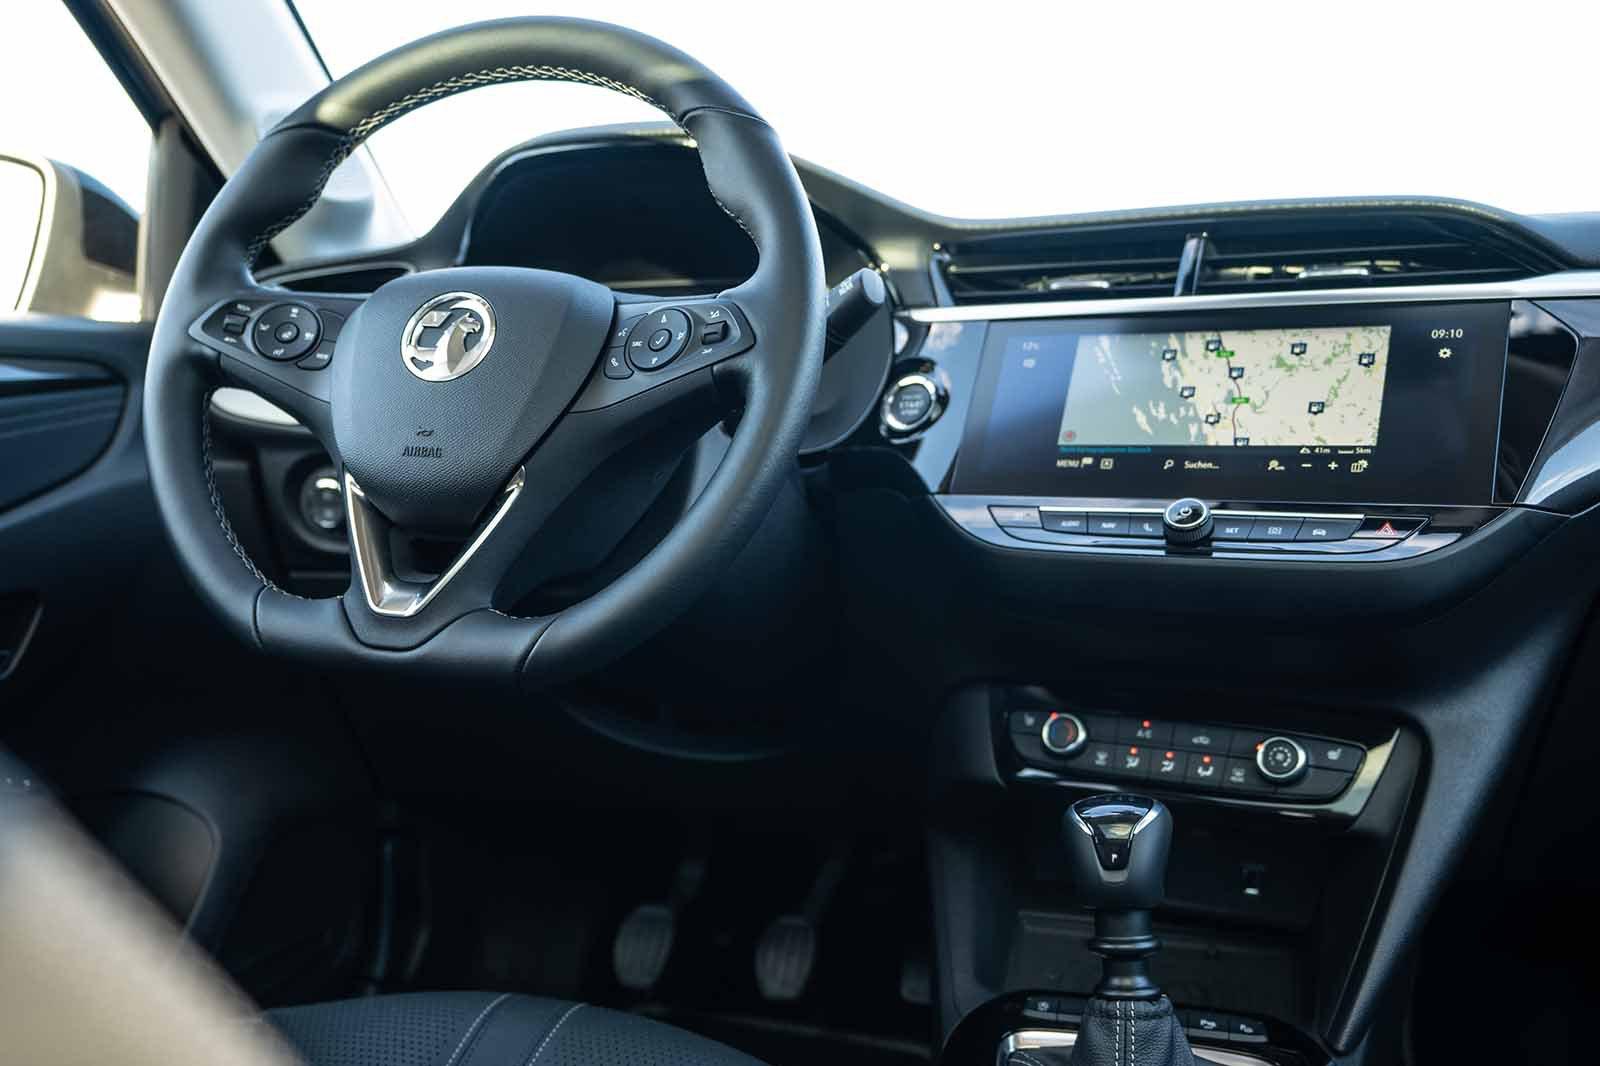 2020 Vauxhall Corsa LHD dashboard